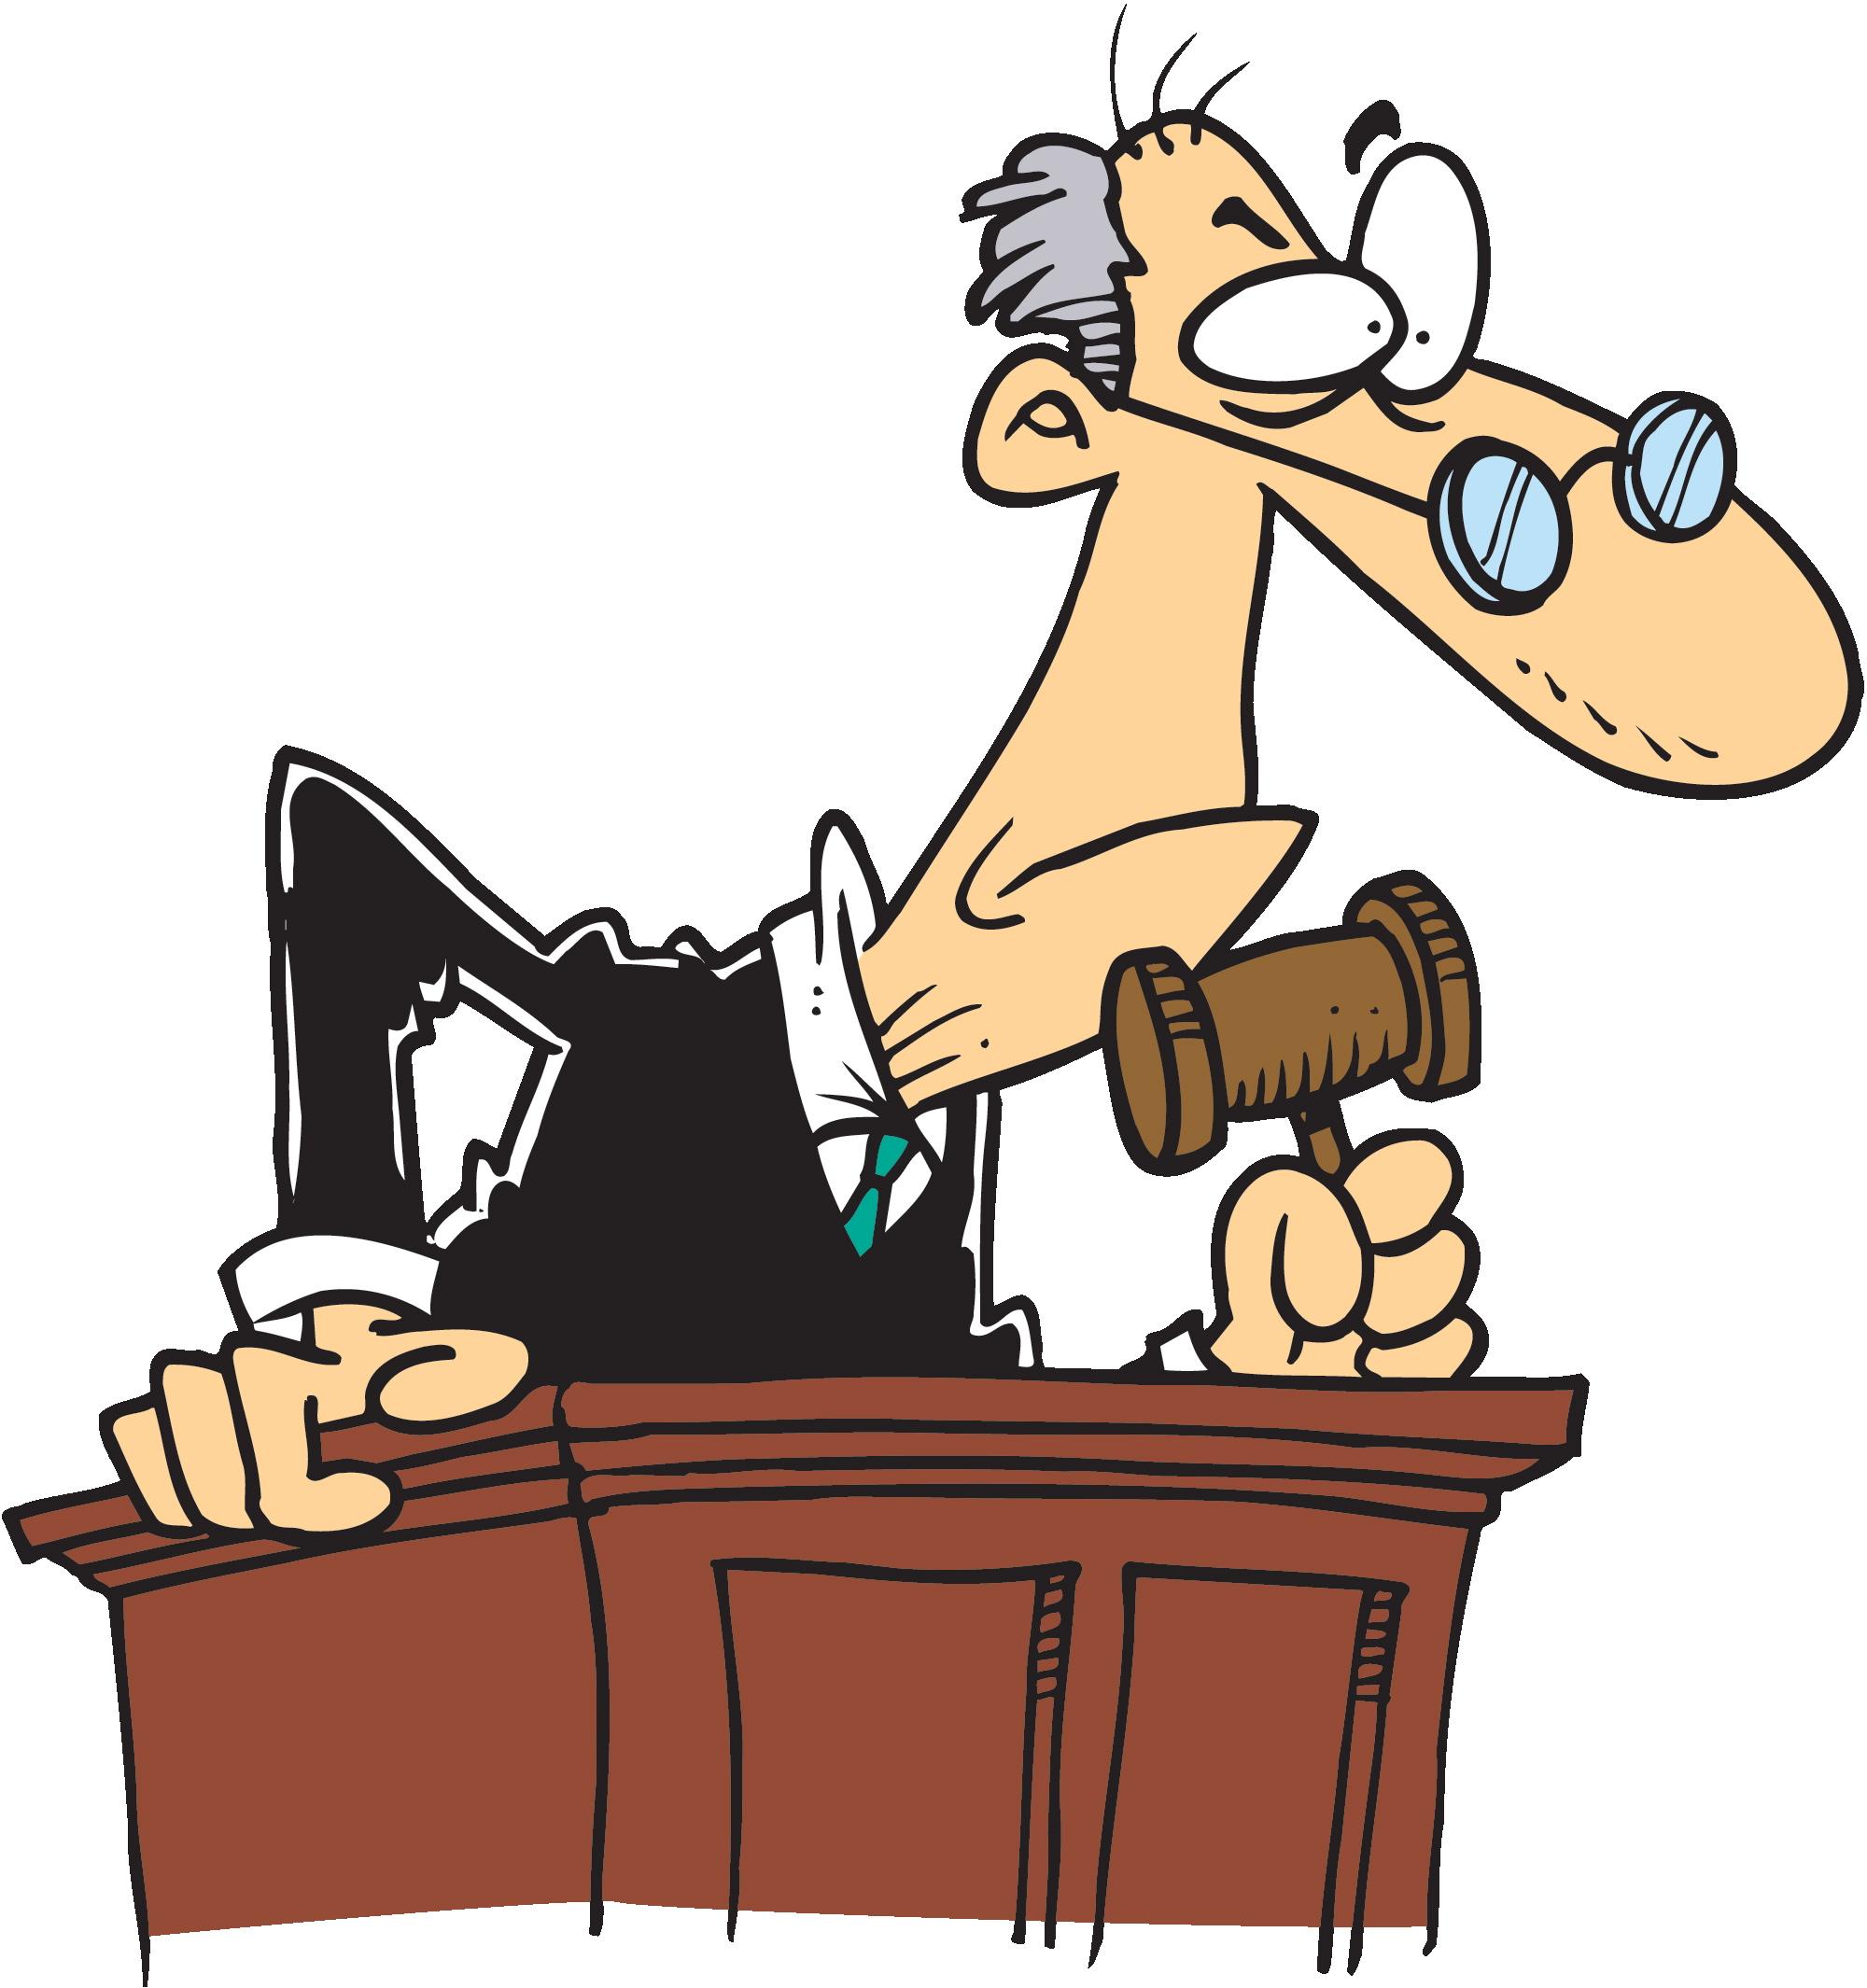 transparent stock Free cliparts download clip. Judge clipart.